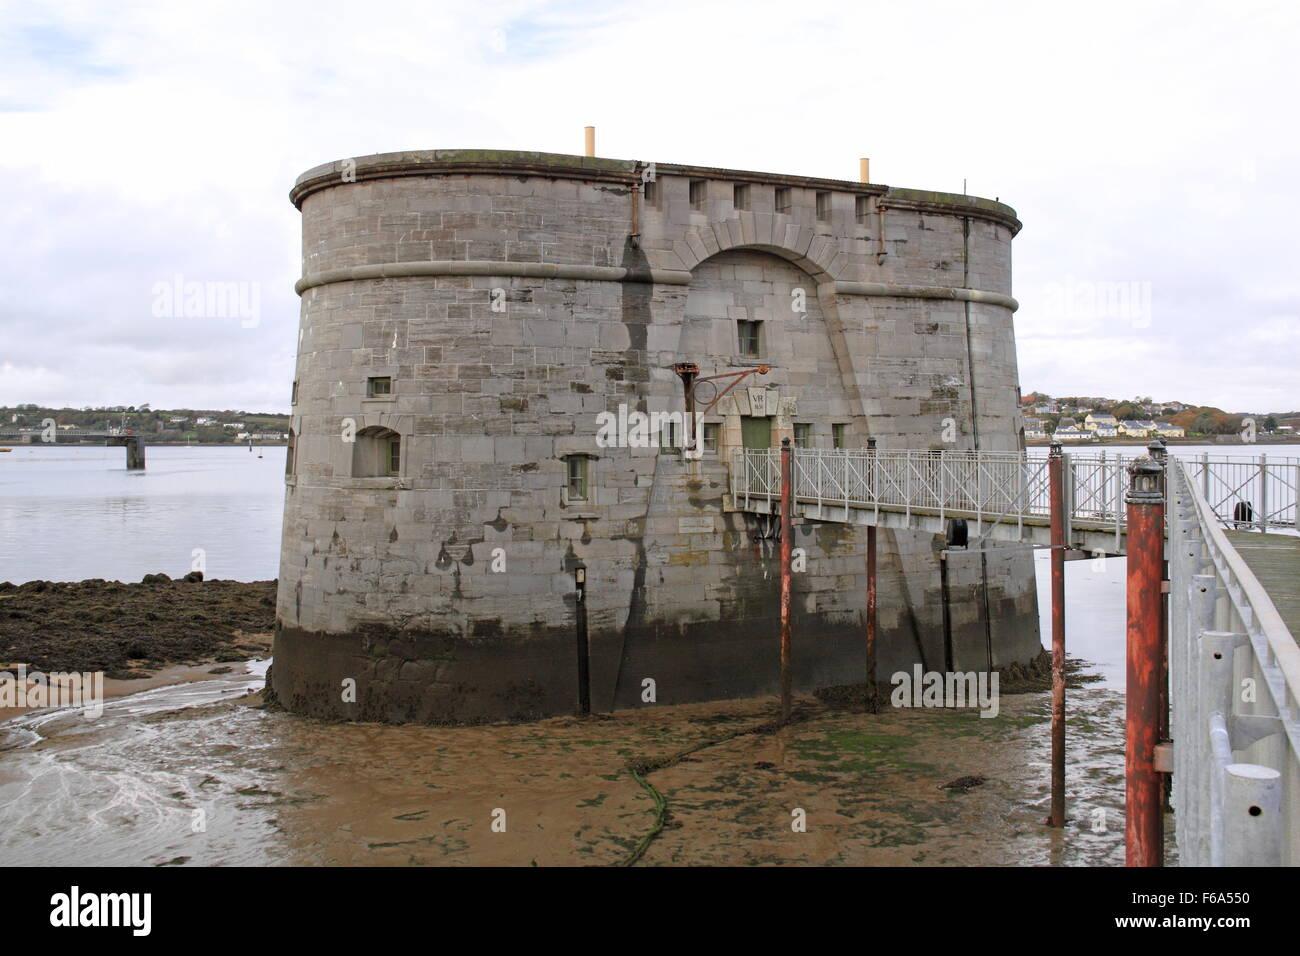 Gun Tower Museum, Royal Dockyard, Pembroke Dock, Pembrokeshire, Dyfed, Gales, Gran Bretaña, Reino Unido, Europa Foto de stock